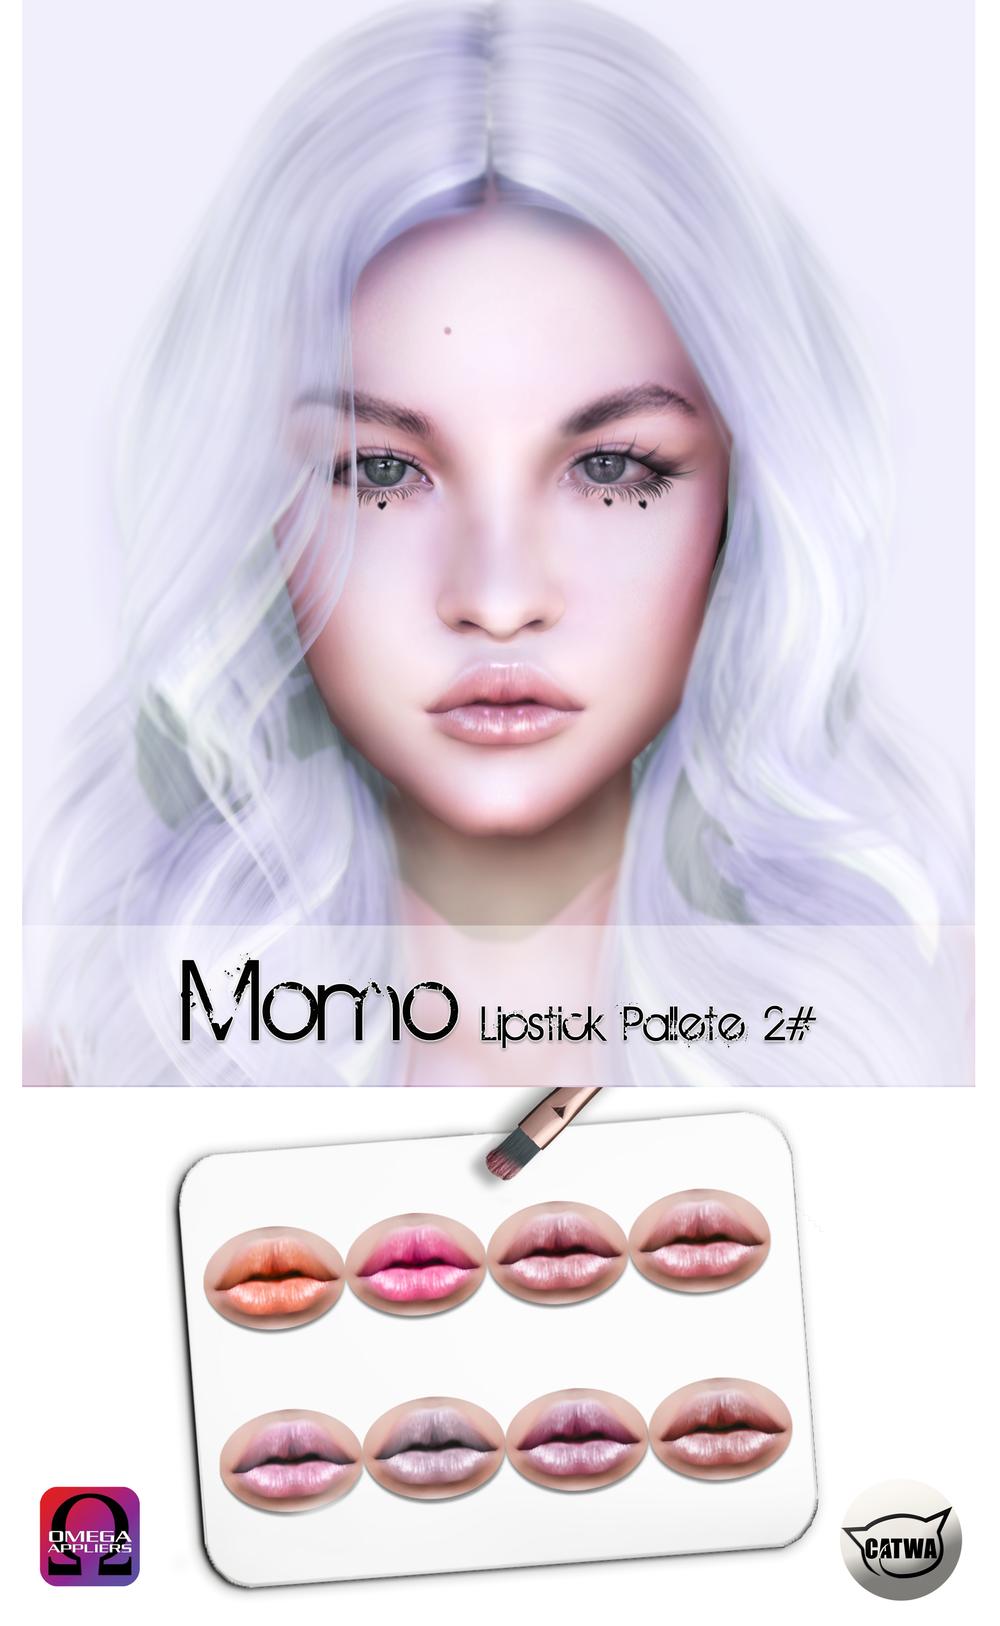 Momo Lipstick Pallete 2# .png